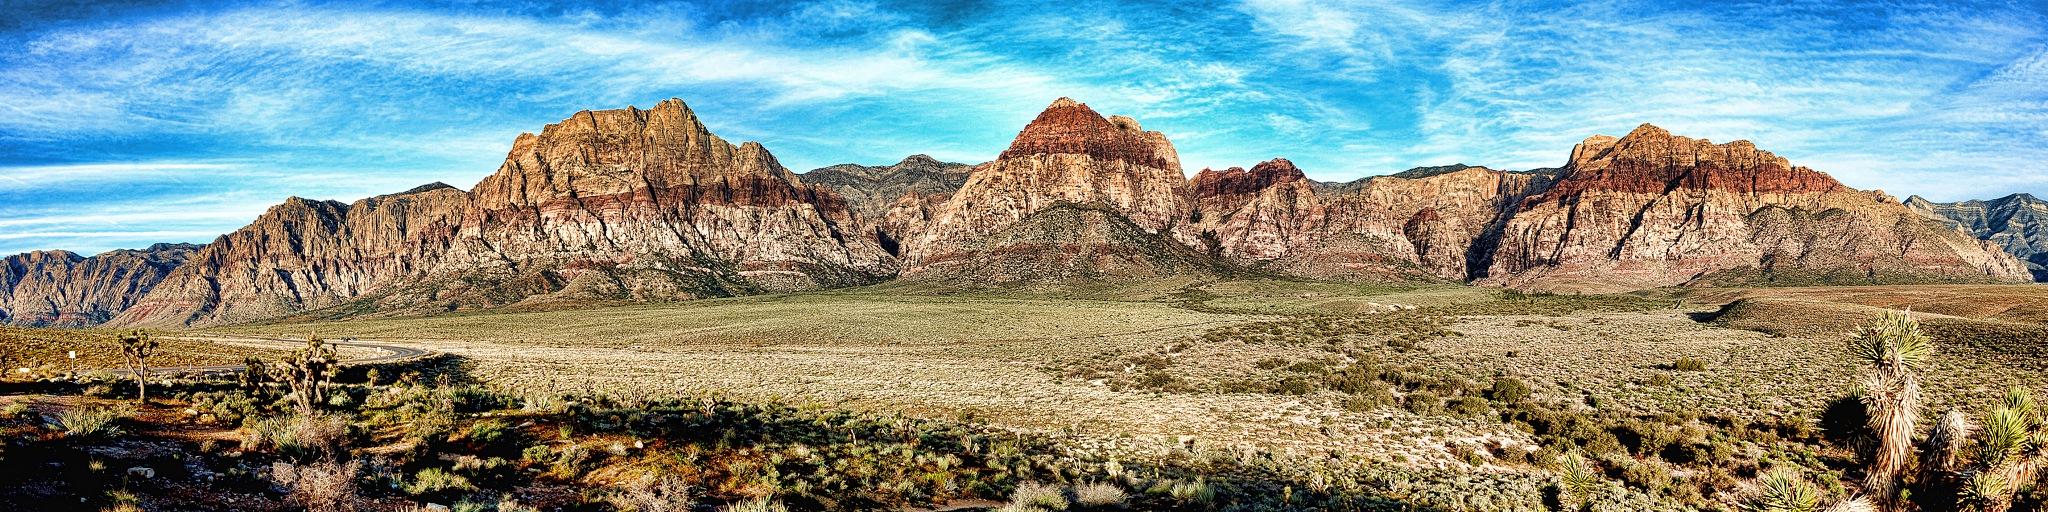 Photo in Landscape #landscape #pano #red rock #las vegas